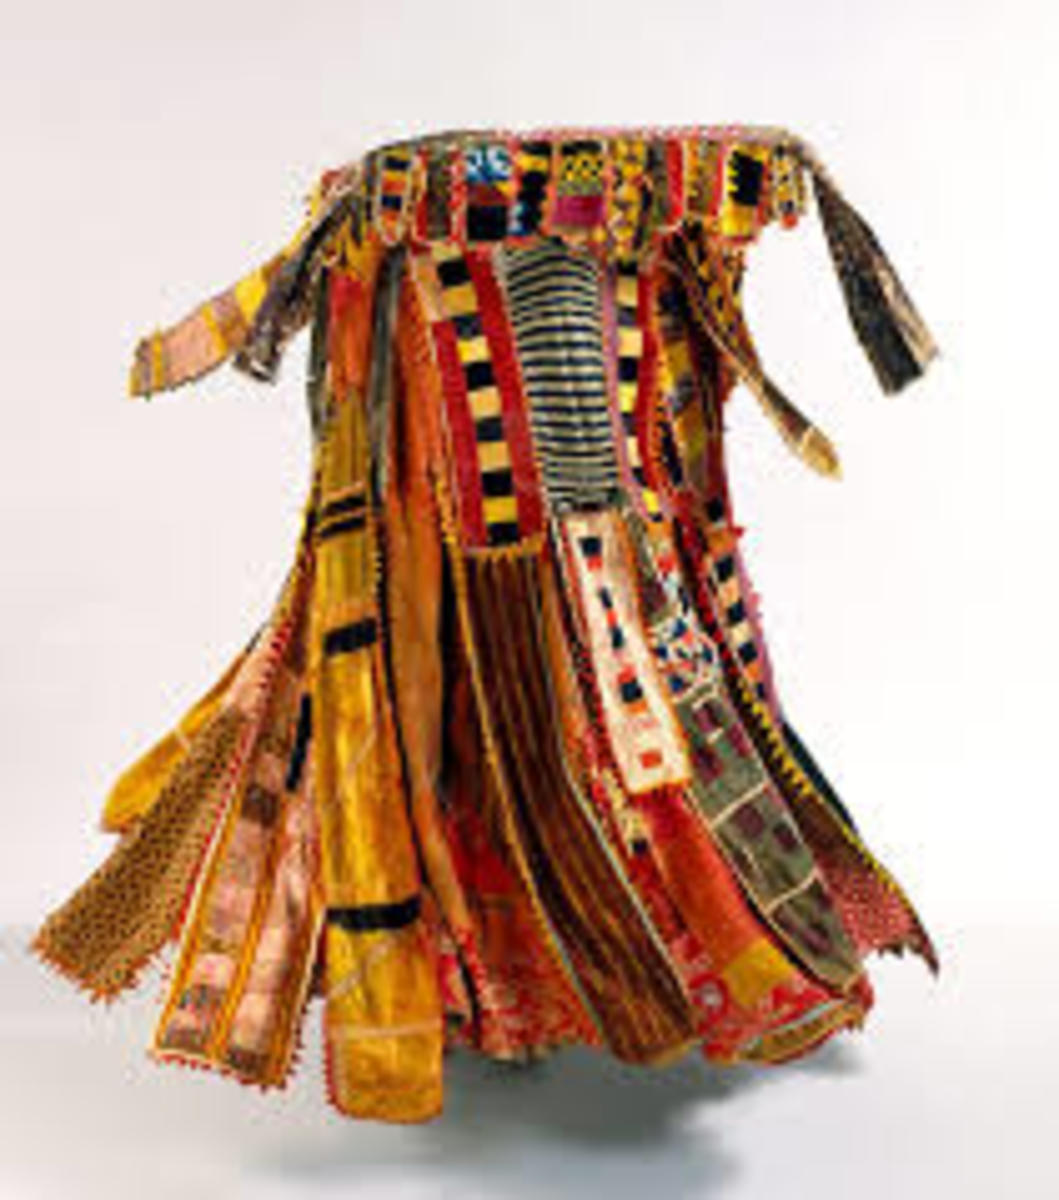 The Egungu masquerade